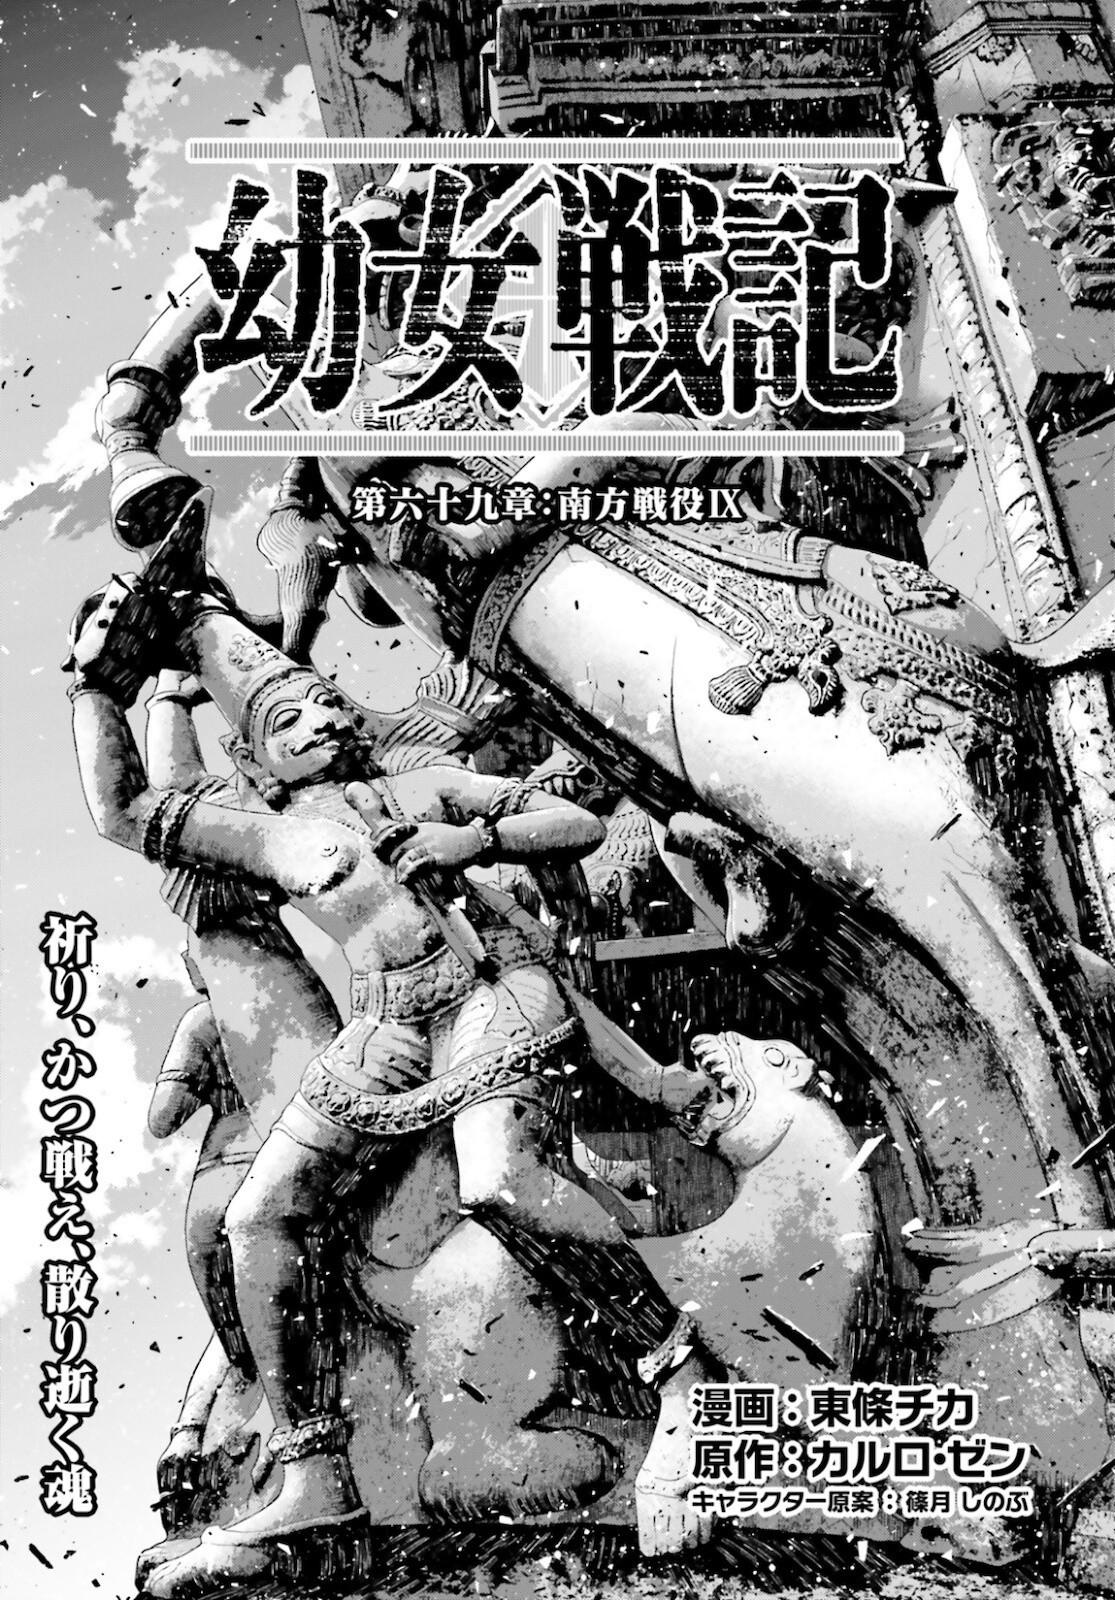 Youjo Senki - Chapter 69 - Page 1